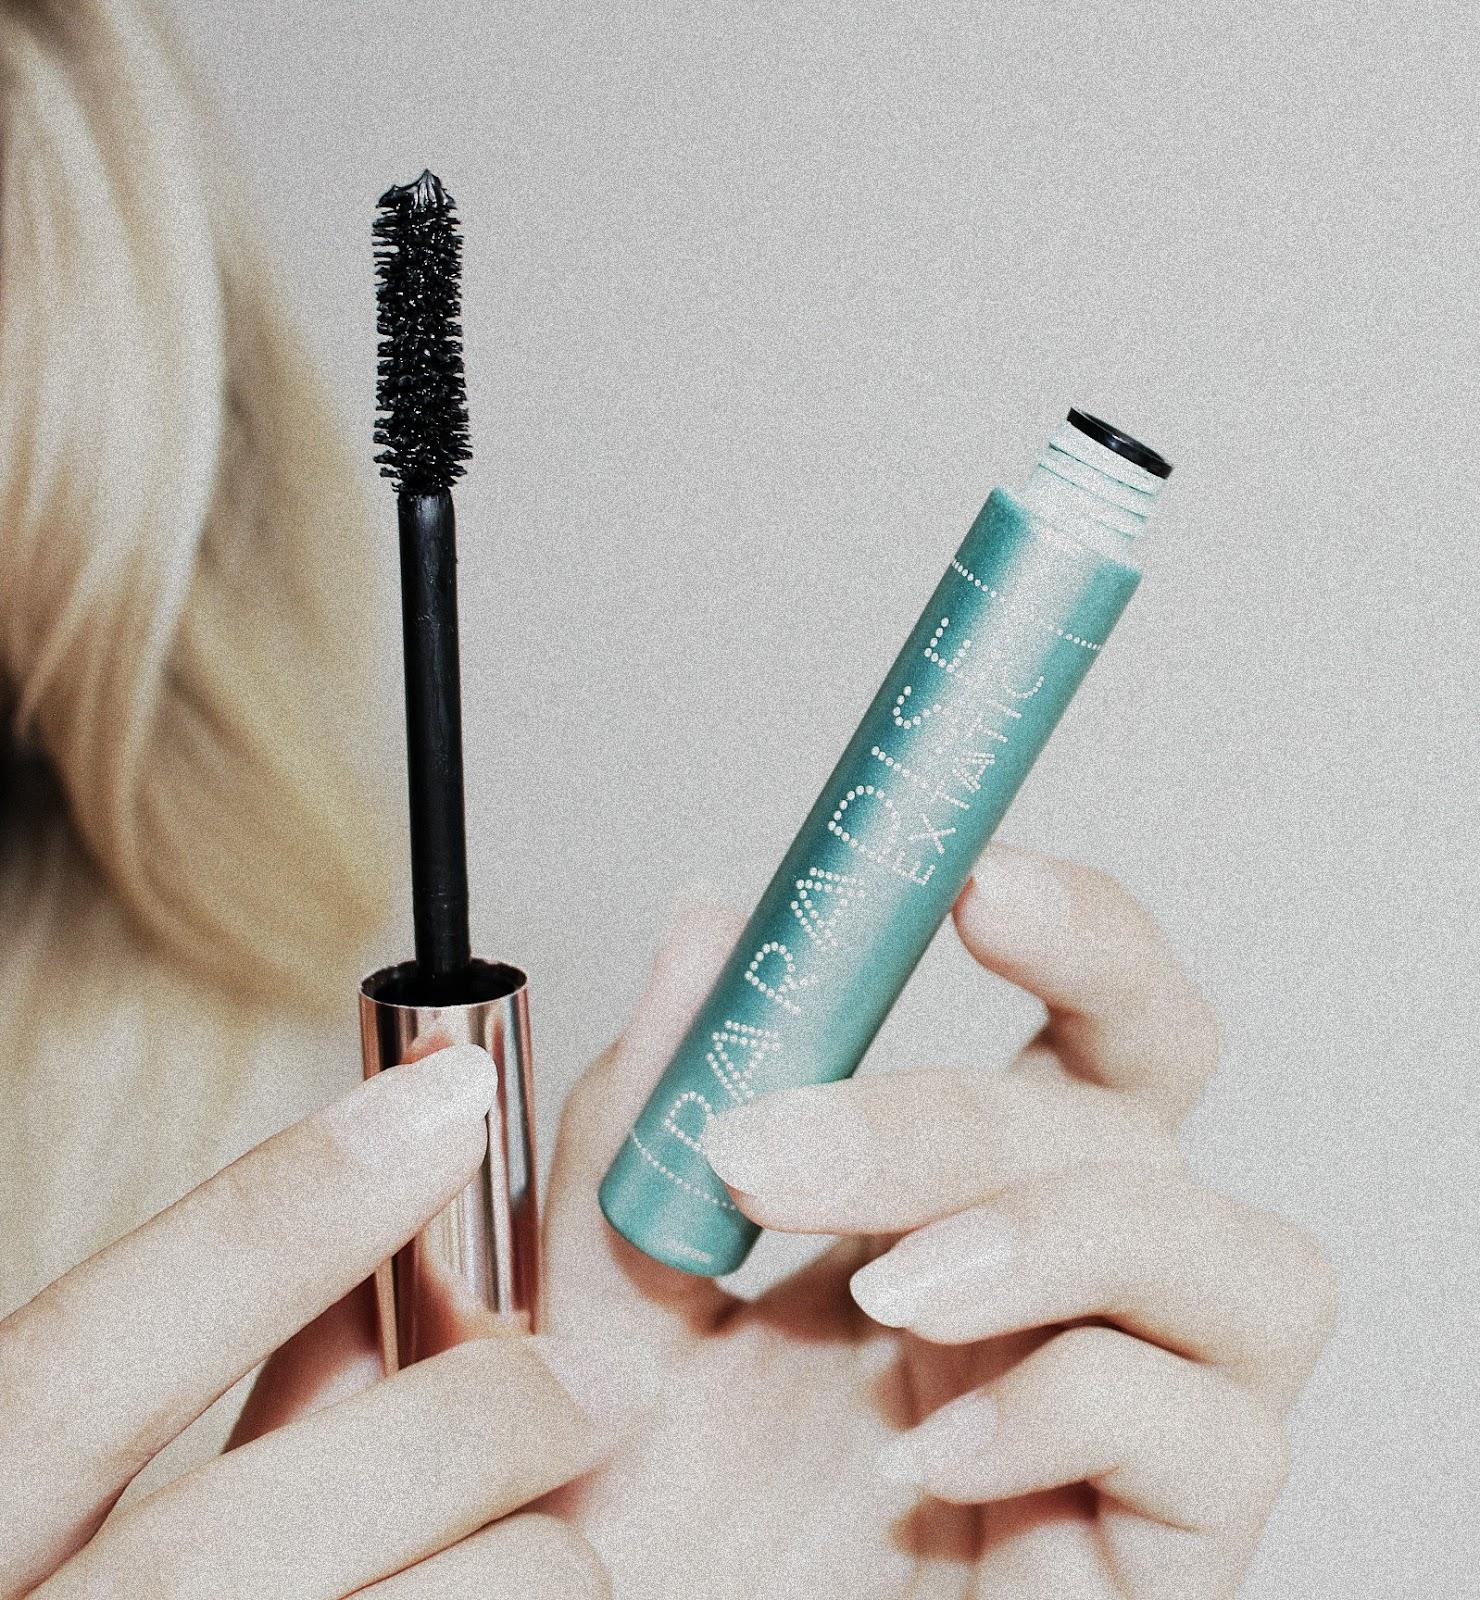 L'Oreal Paradise Mascara Brush